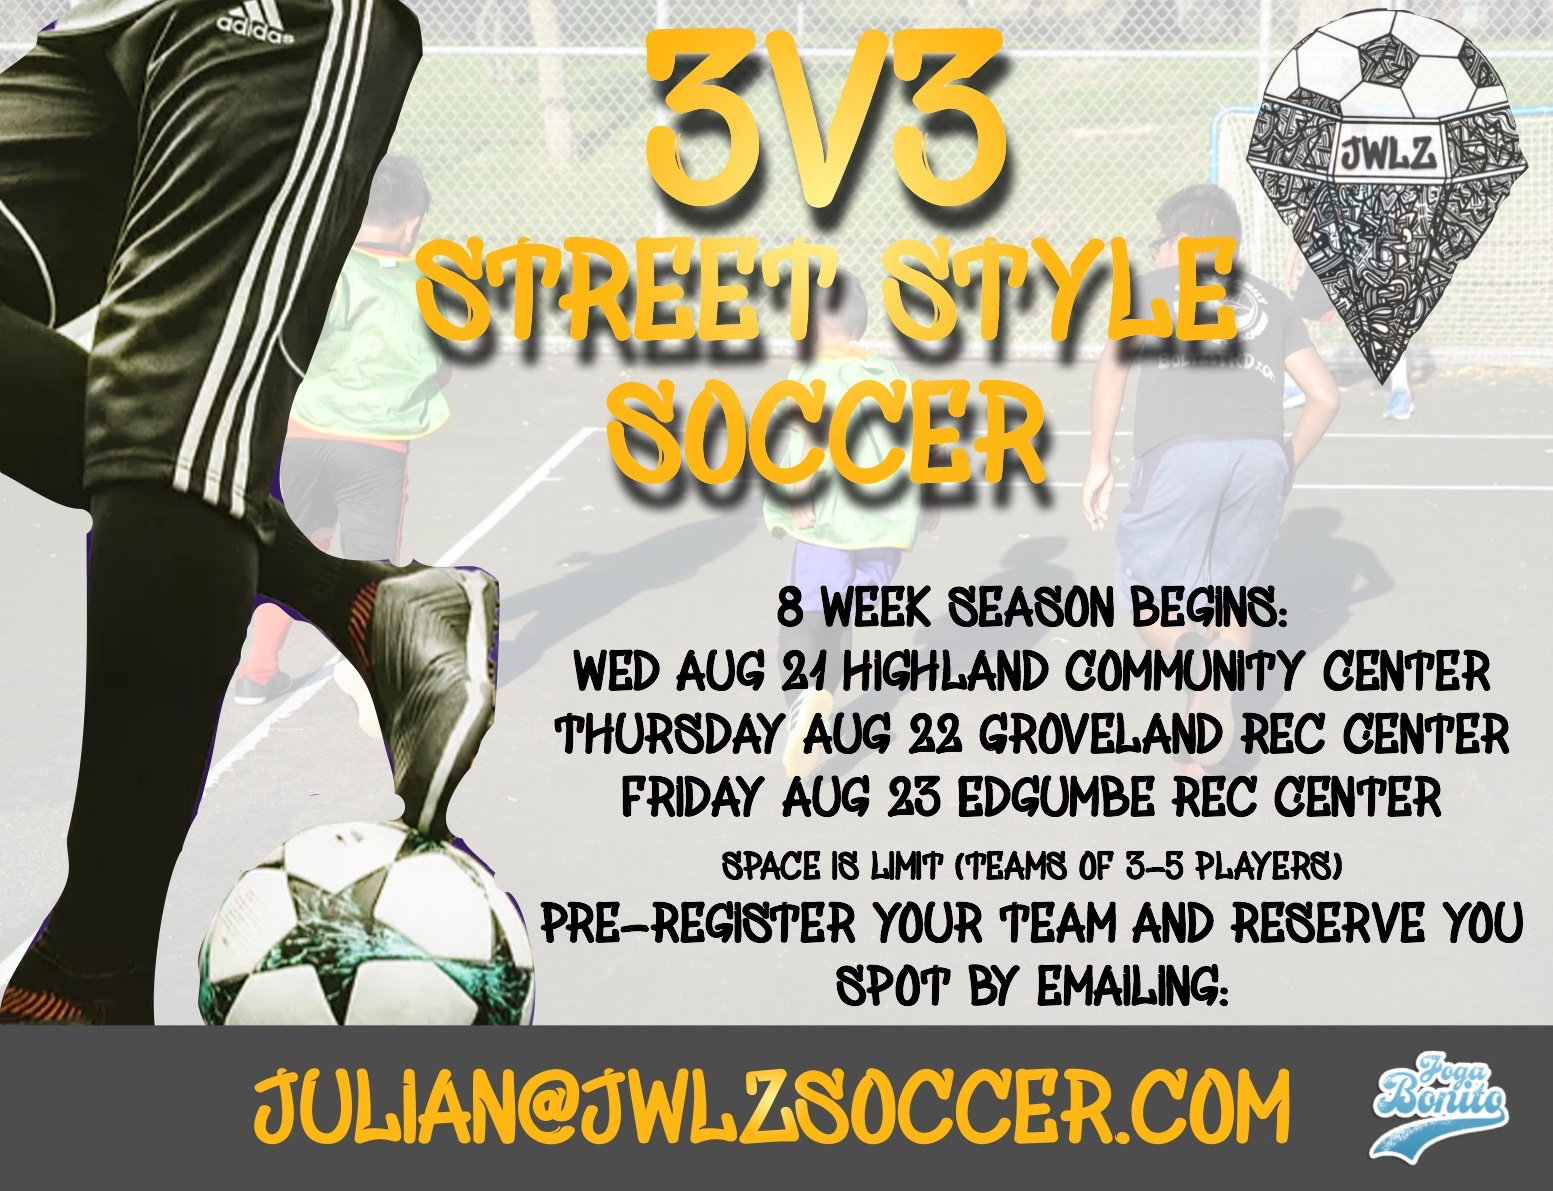 3v3 Street Style League